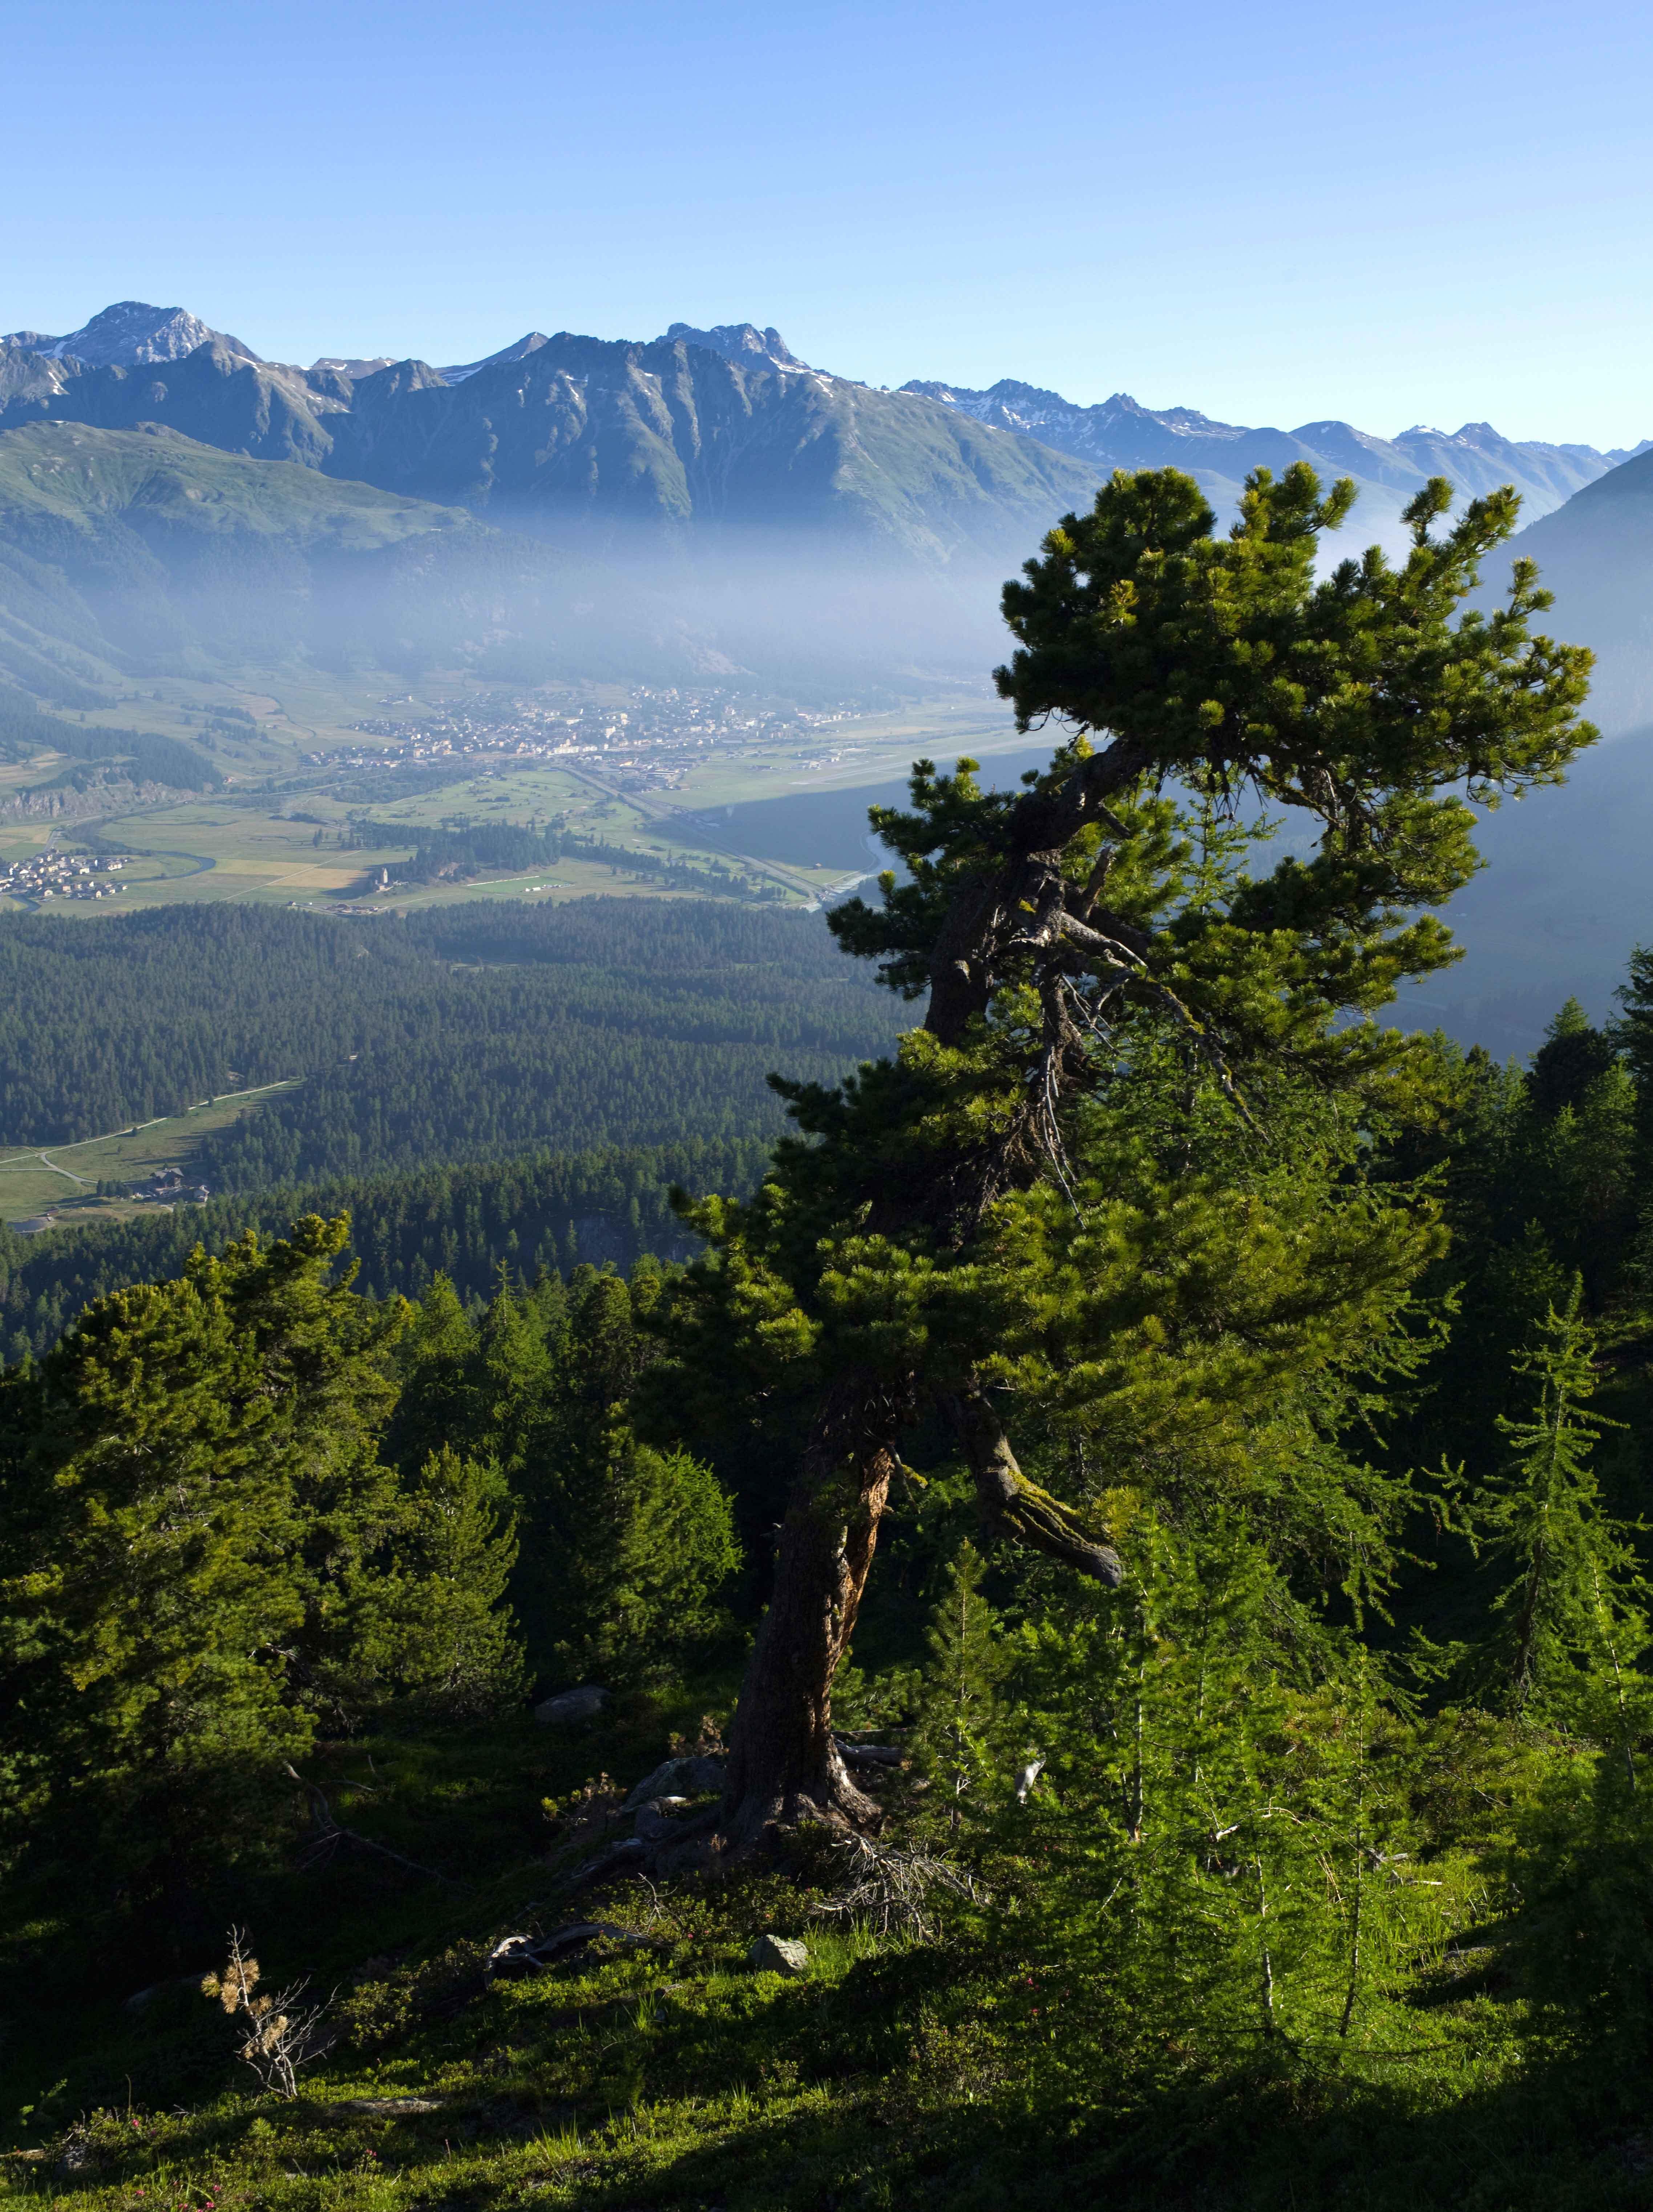 Over 1000 years old Swiss stone pine at Muottas da Schlarigna with view of the Piz Kesch (3418m).